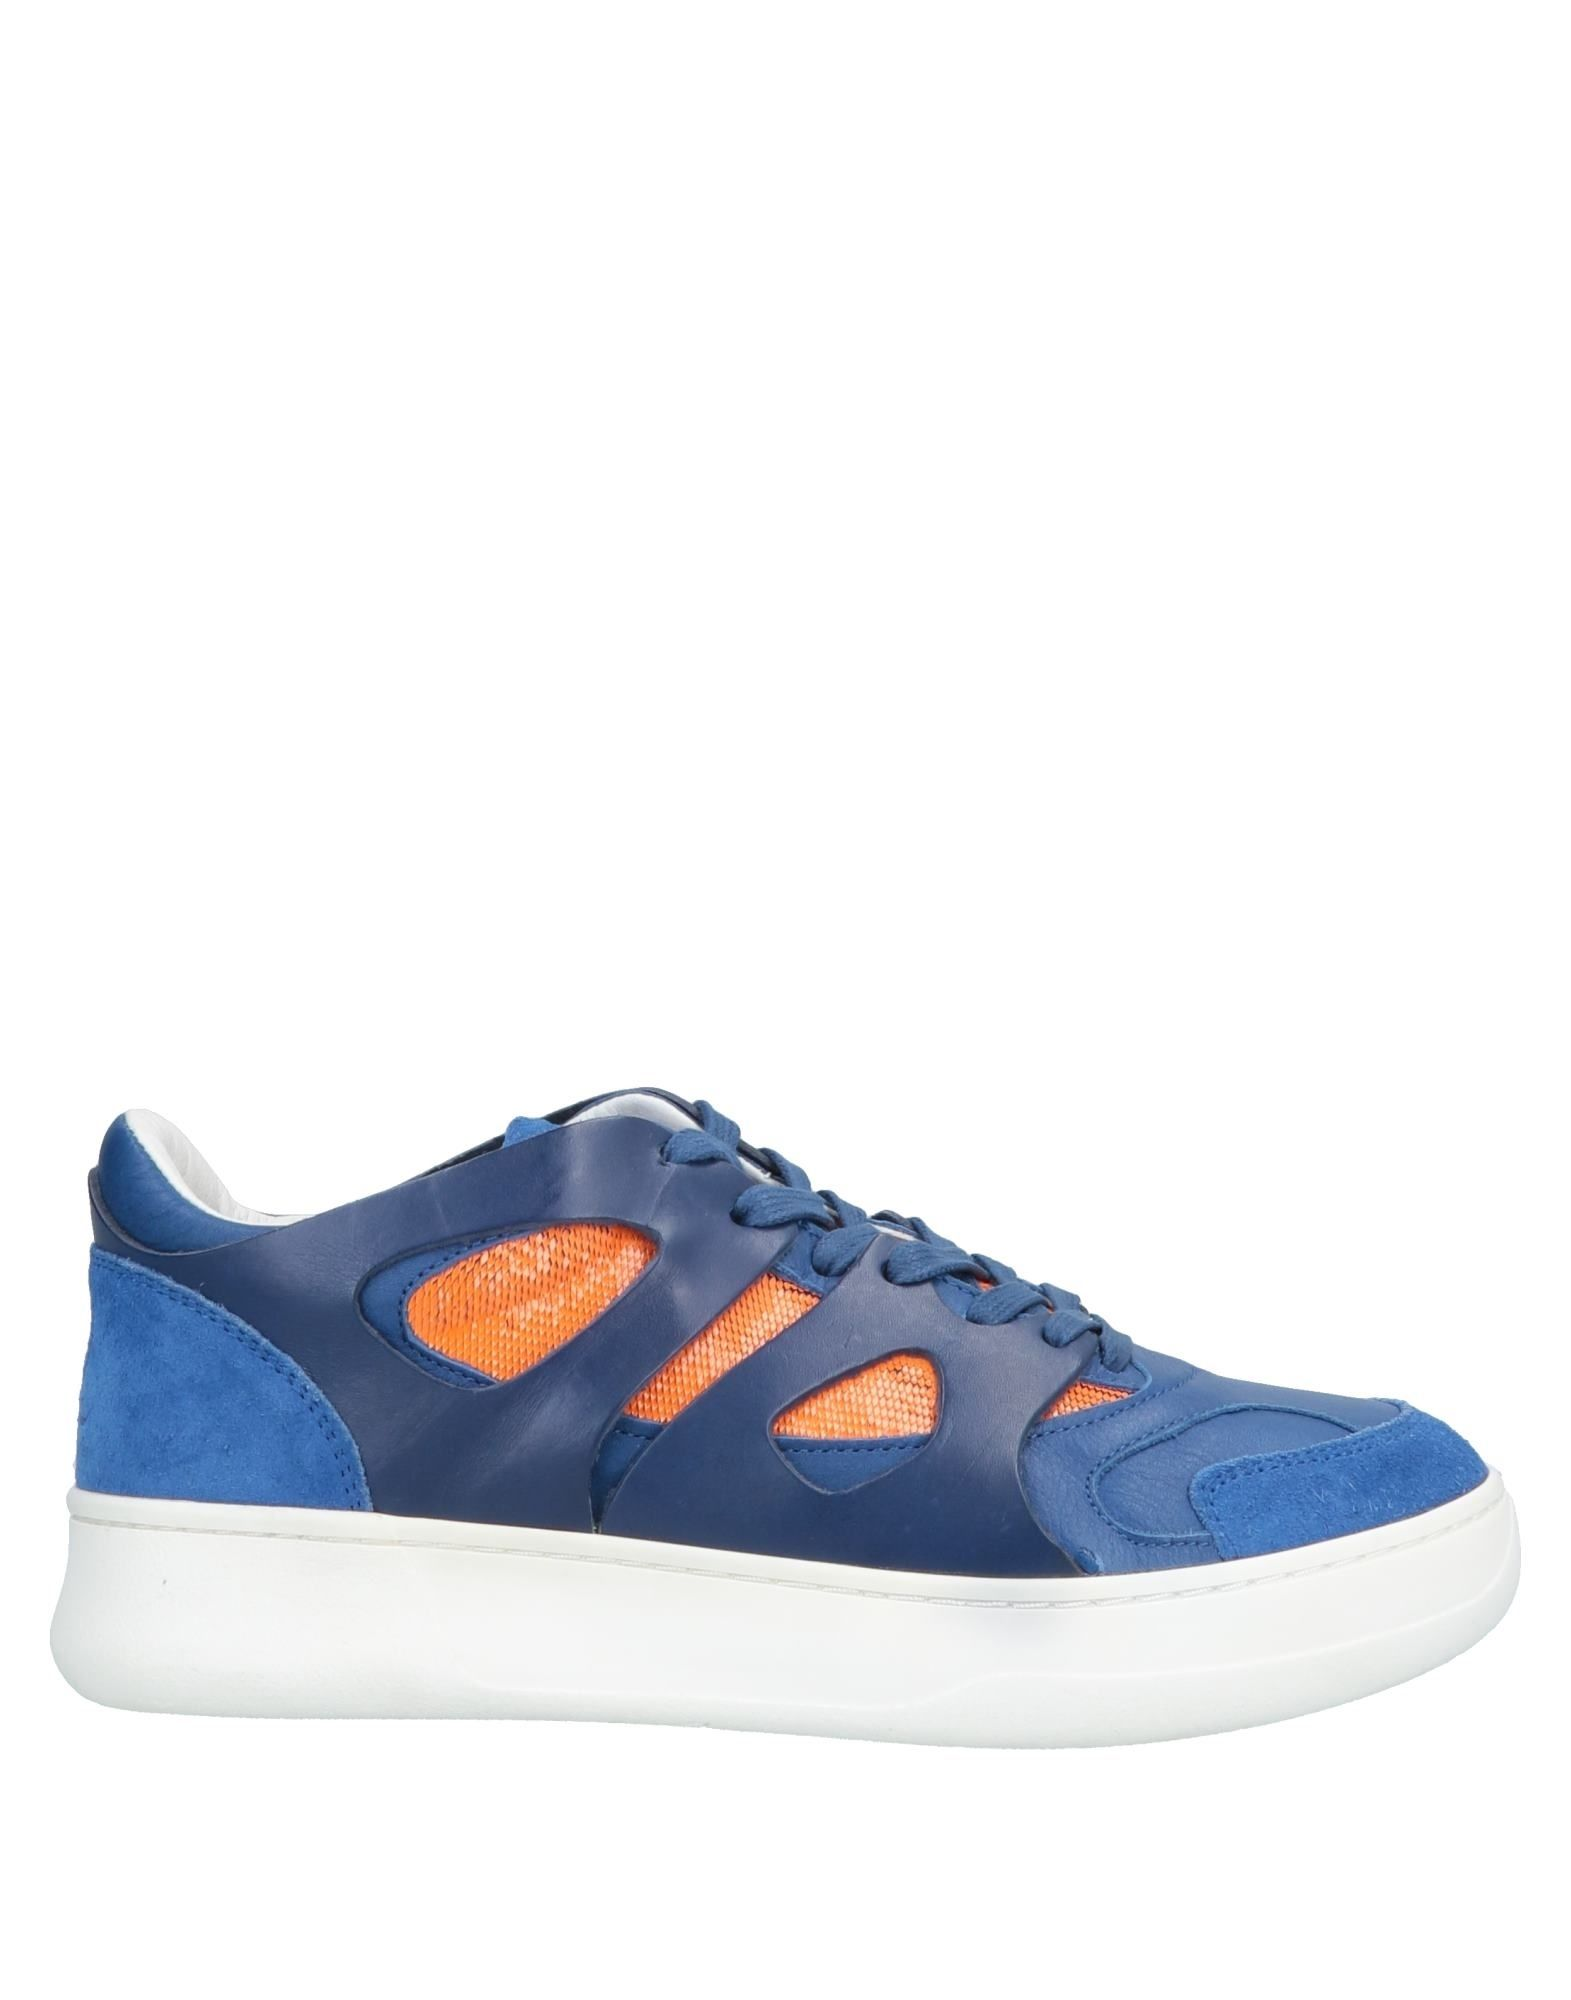 bc9513e7648 Alexander Mcqueen Puma Sneakers - Men Alexander Mcqueen Puma ...